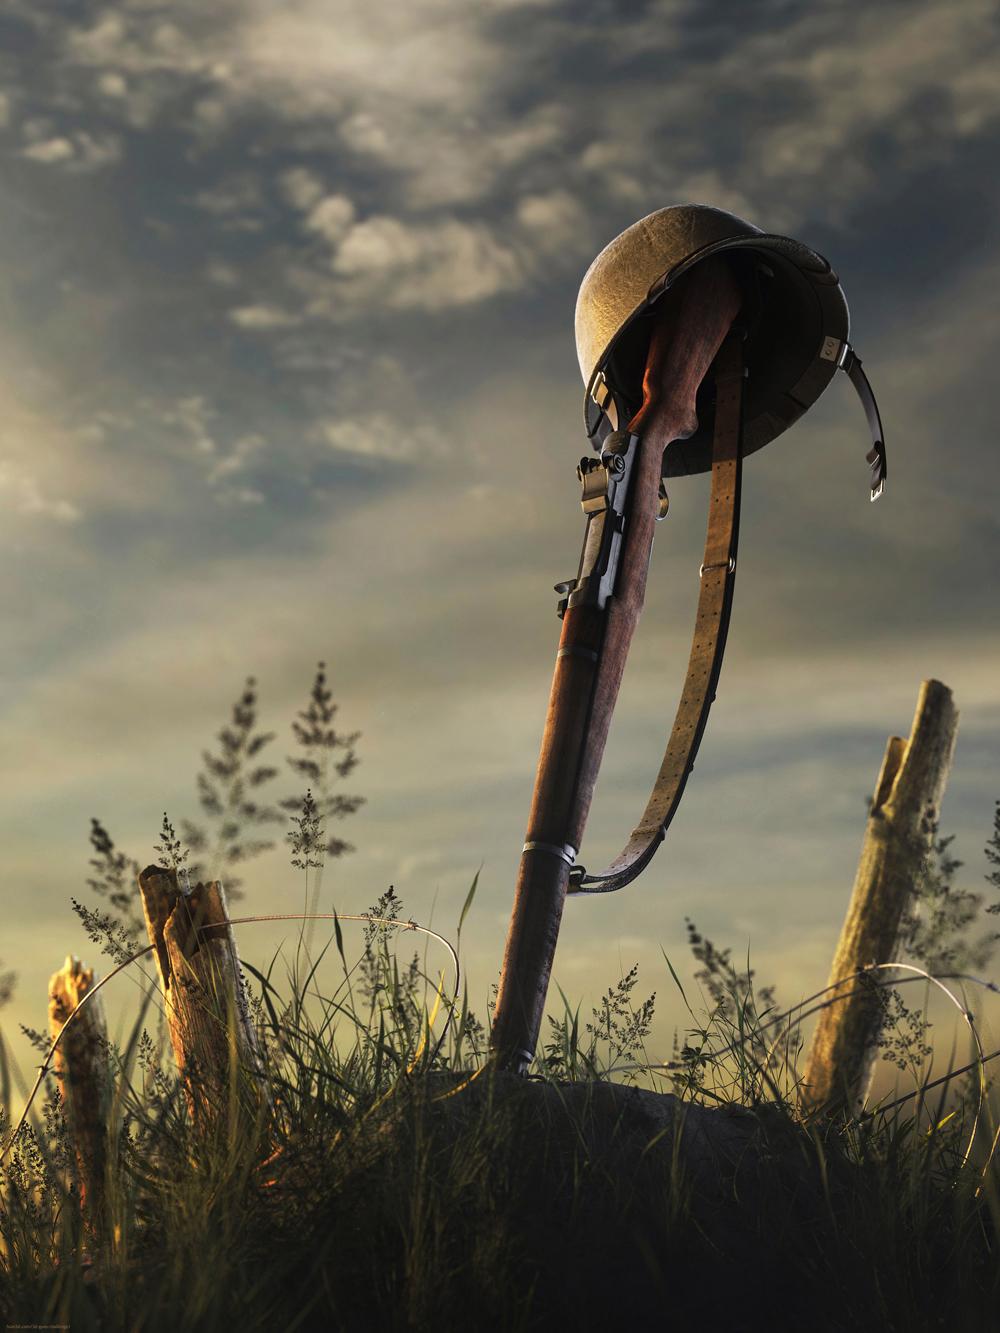 M1 Garand by bART